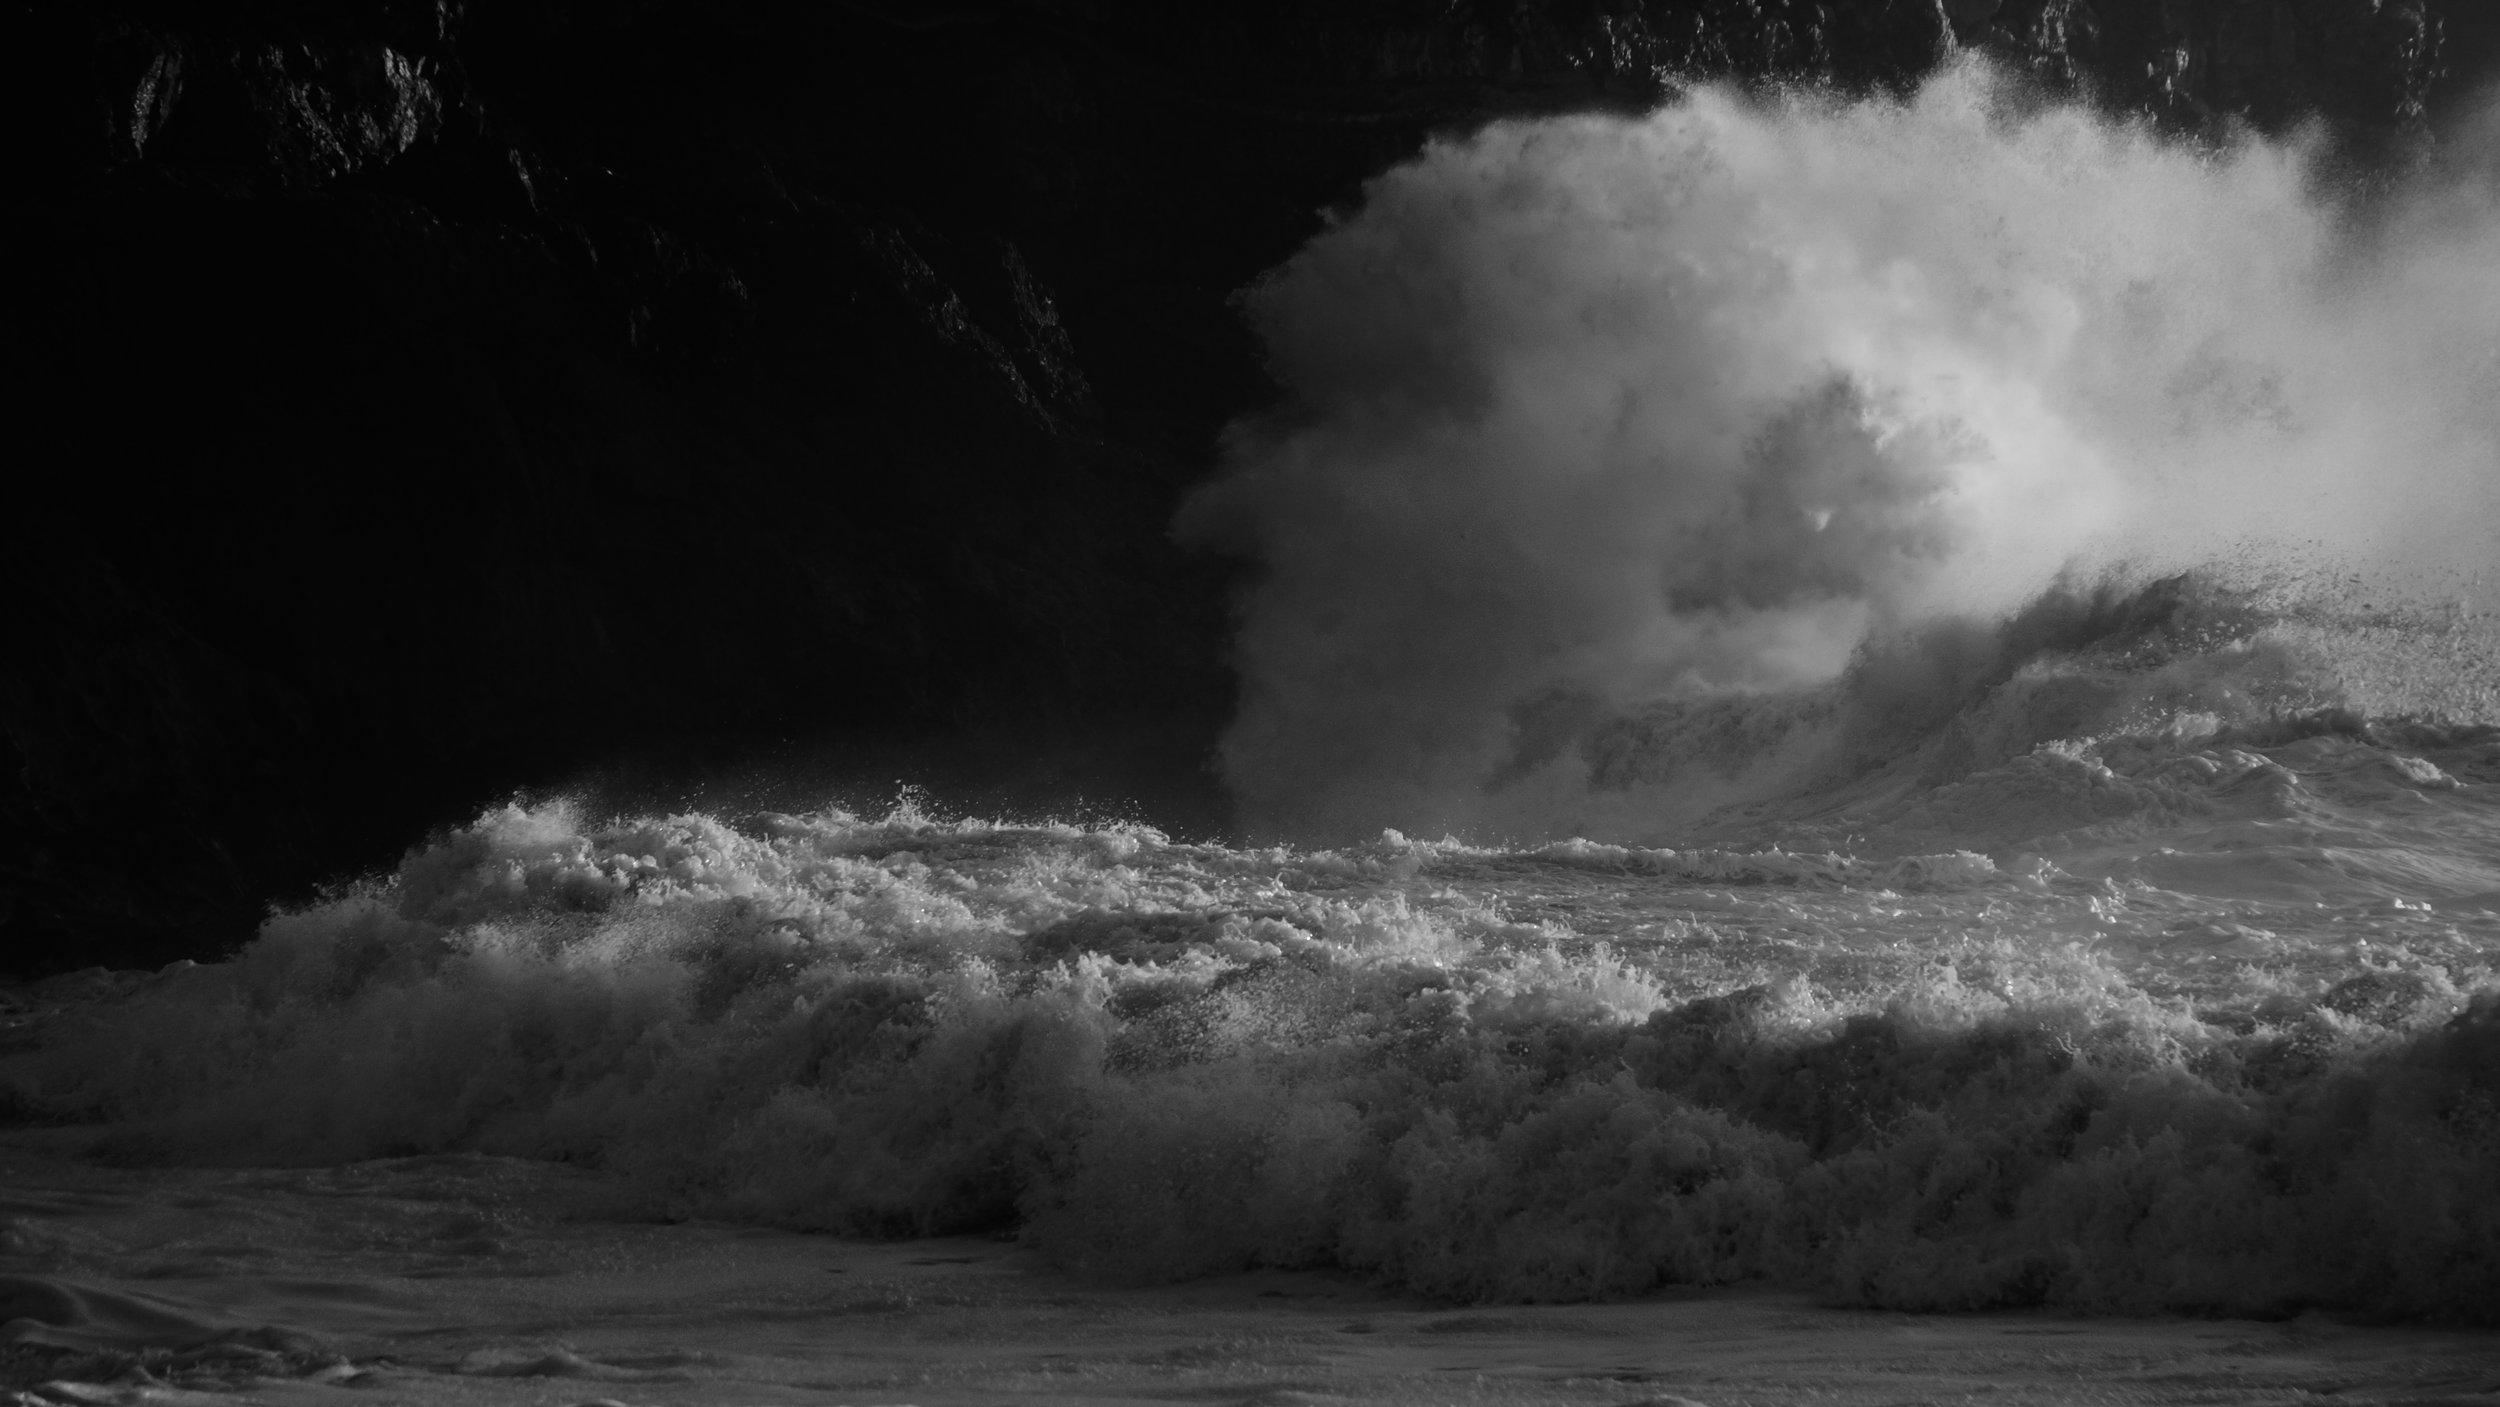 Photo by  Alexander Marinescu  on  Unsplash